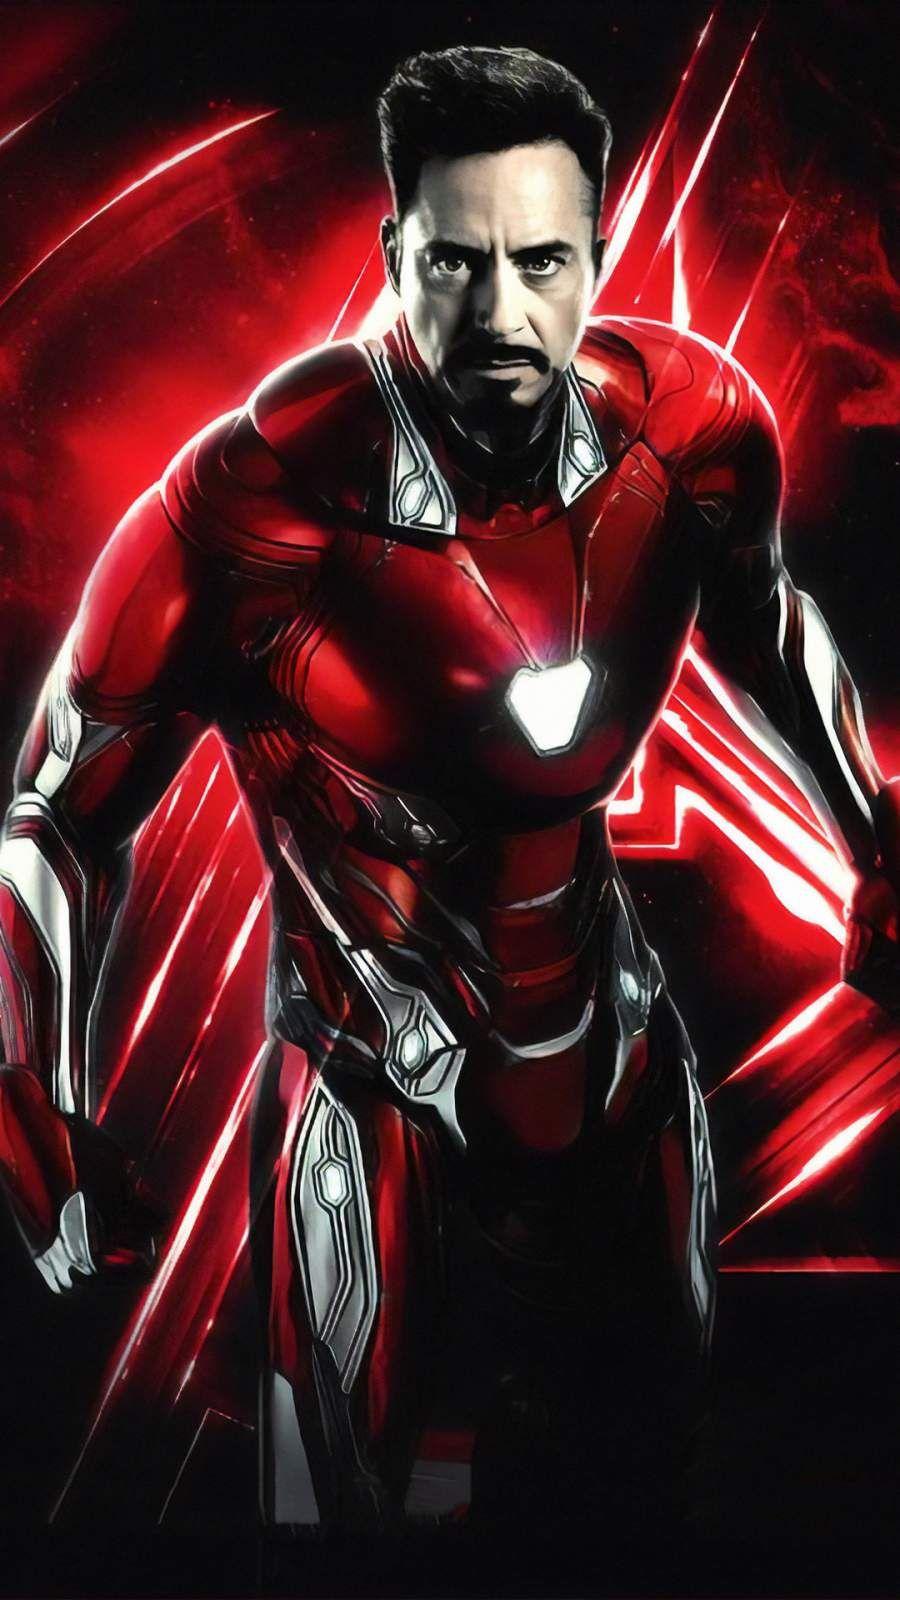 Avengers End Game Iron Man Iphone Wallpaper Iron Man Iphone Wallpaper Android Phone Wallpaper